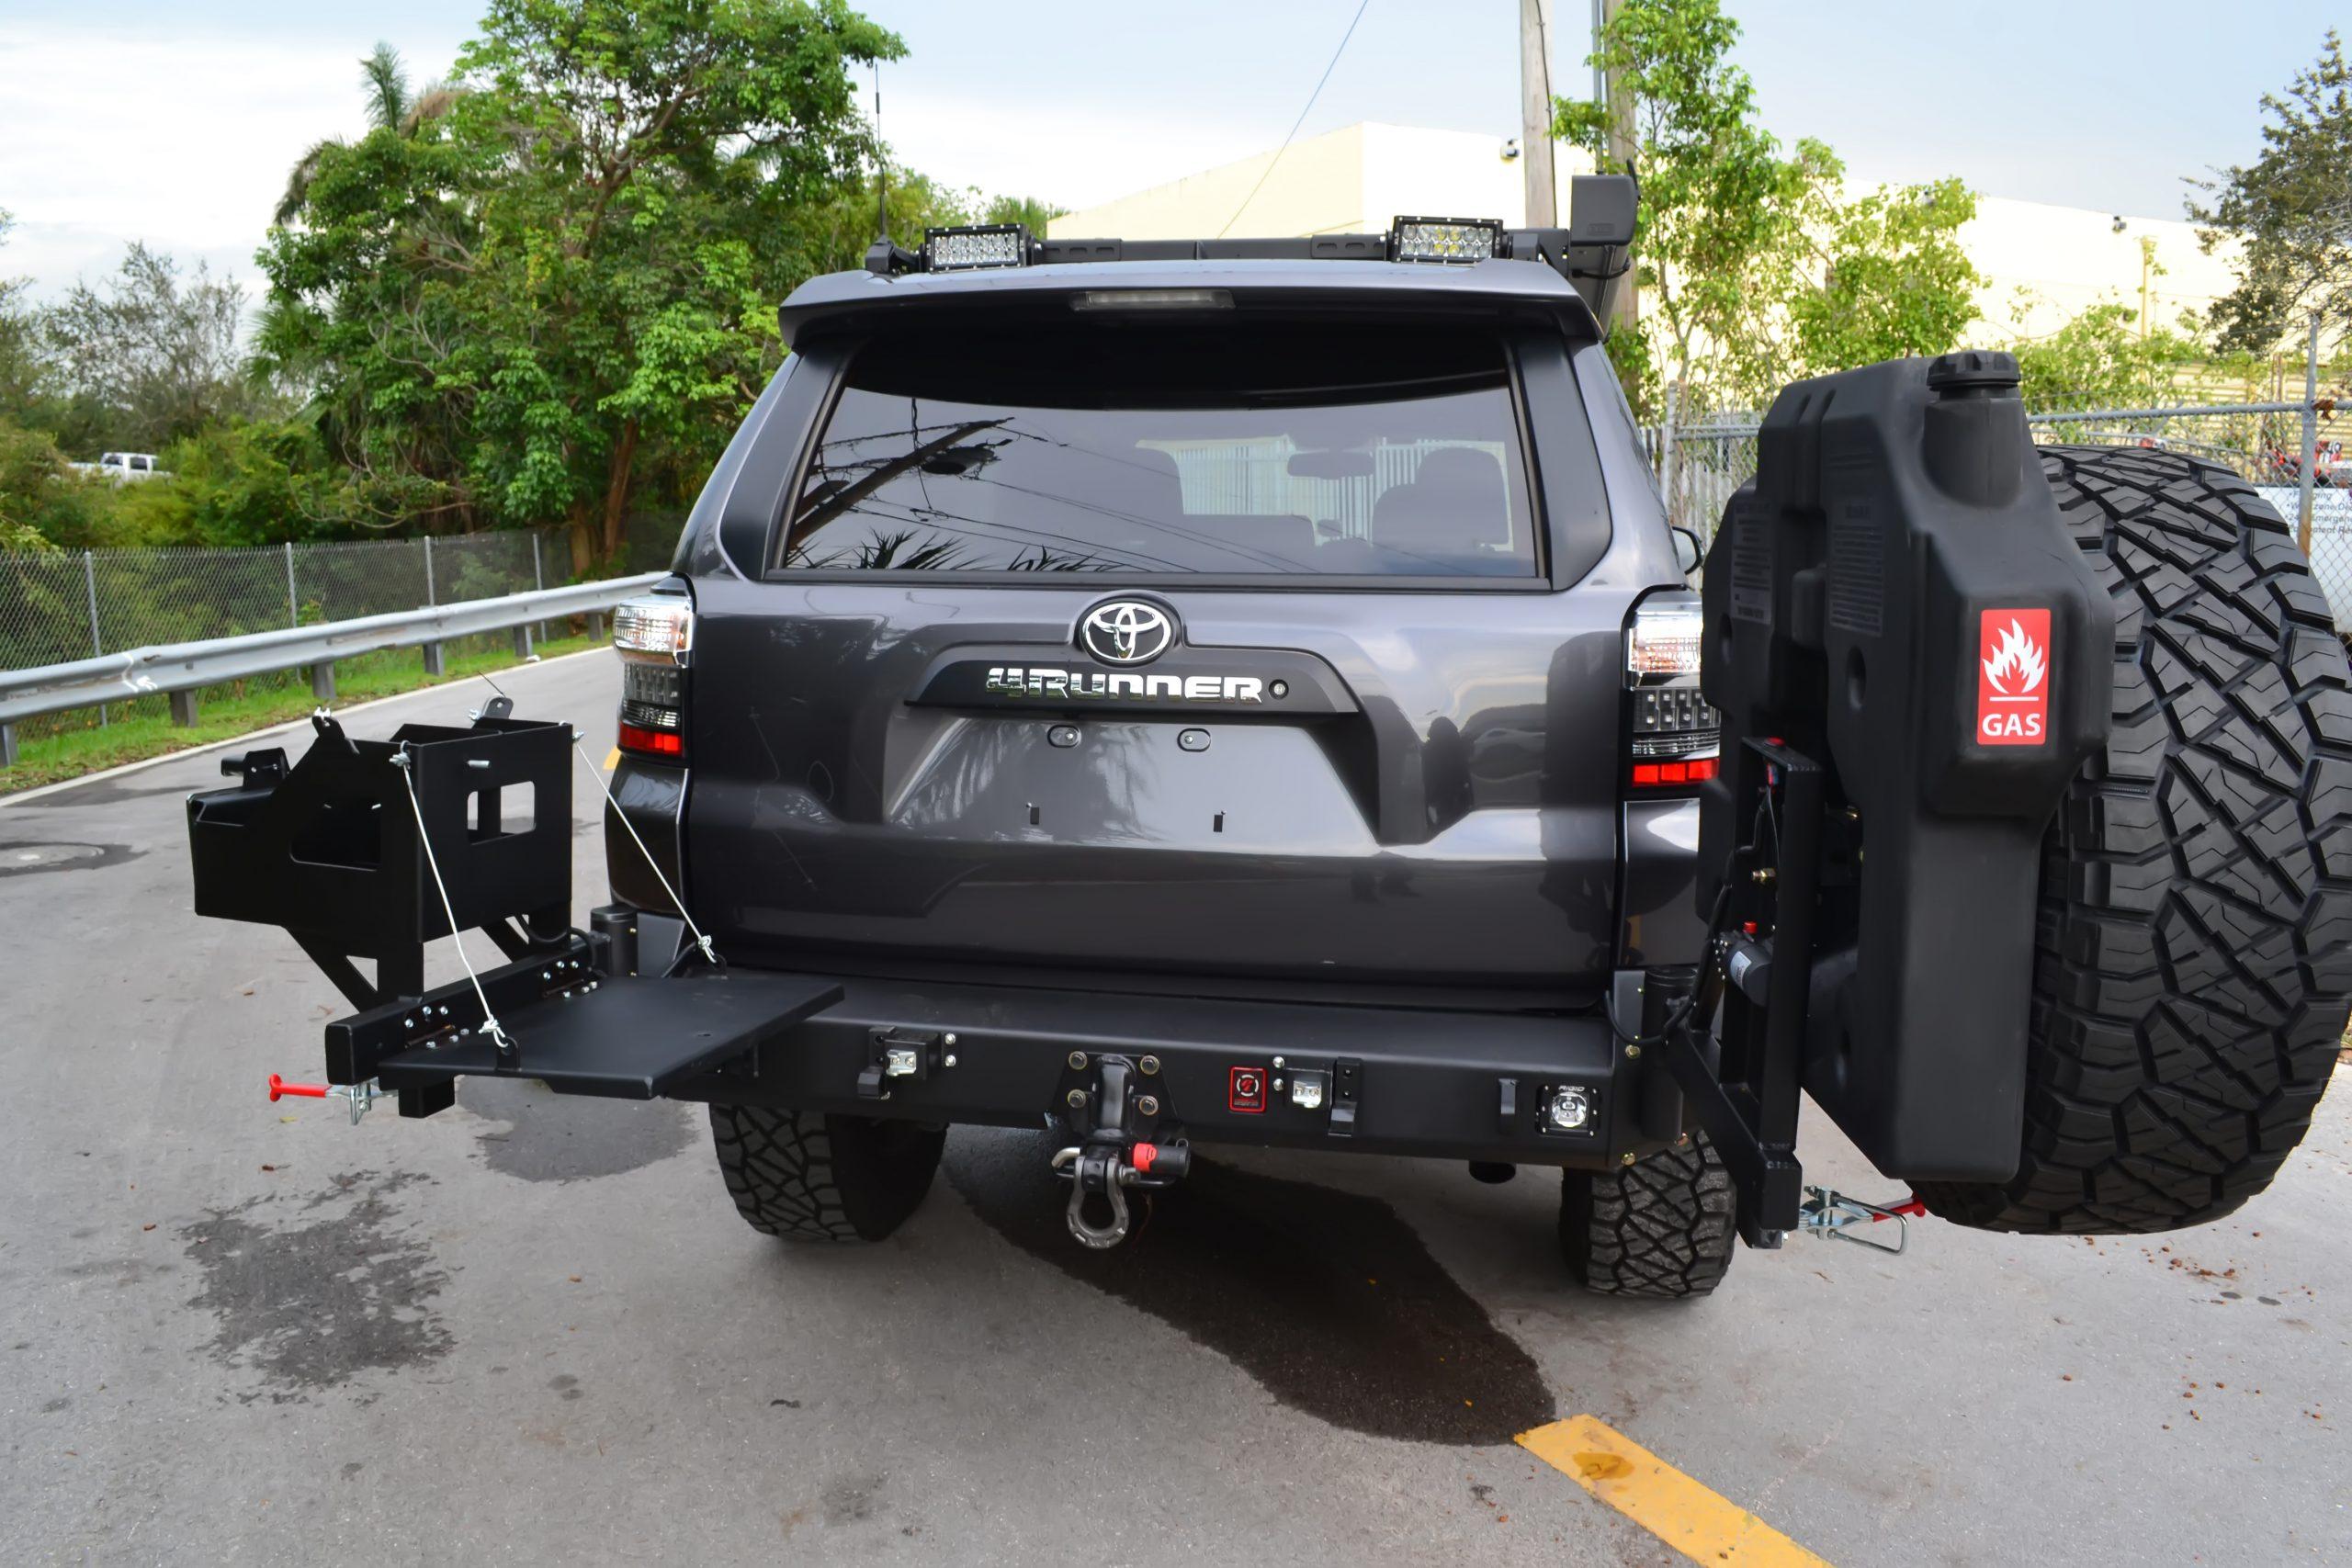 Toyota 4runner 2010 Up Rear Elite Bumper Proline 4wd Equipment Miami Florida